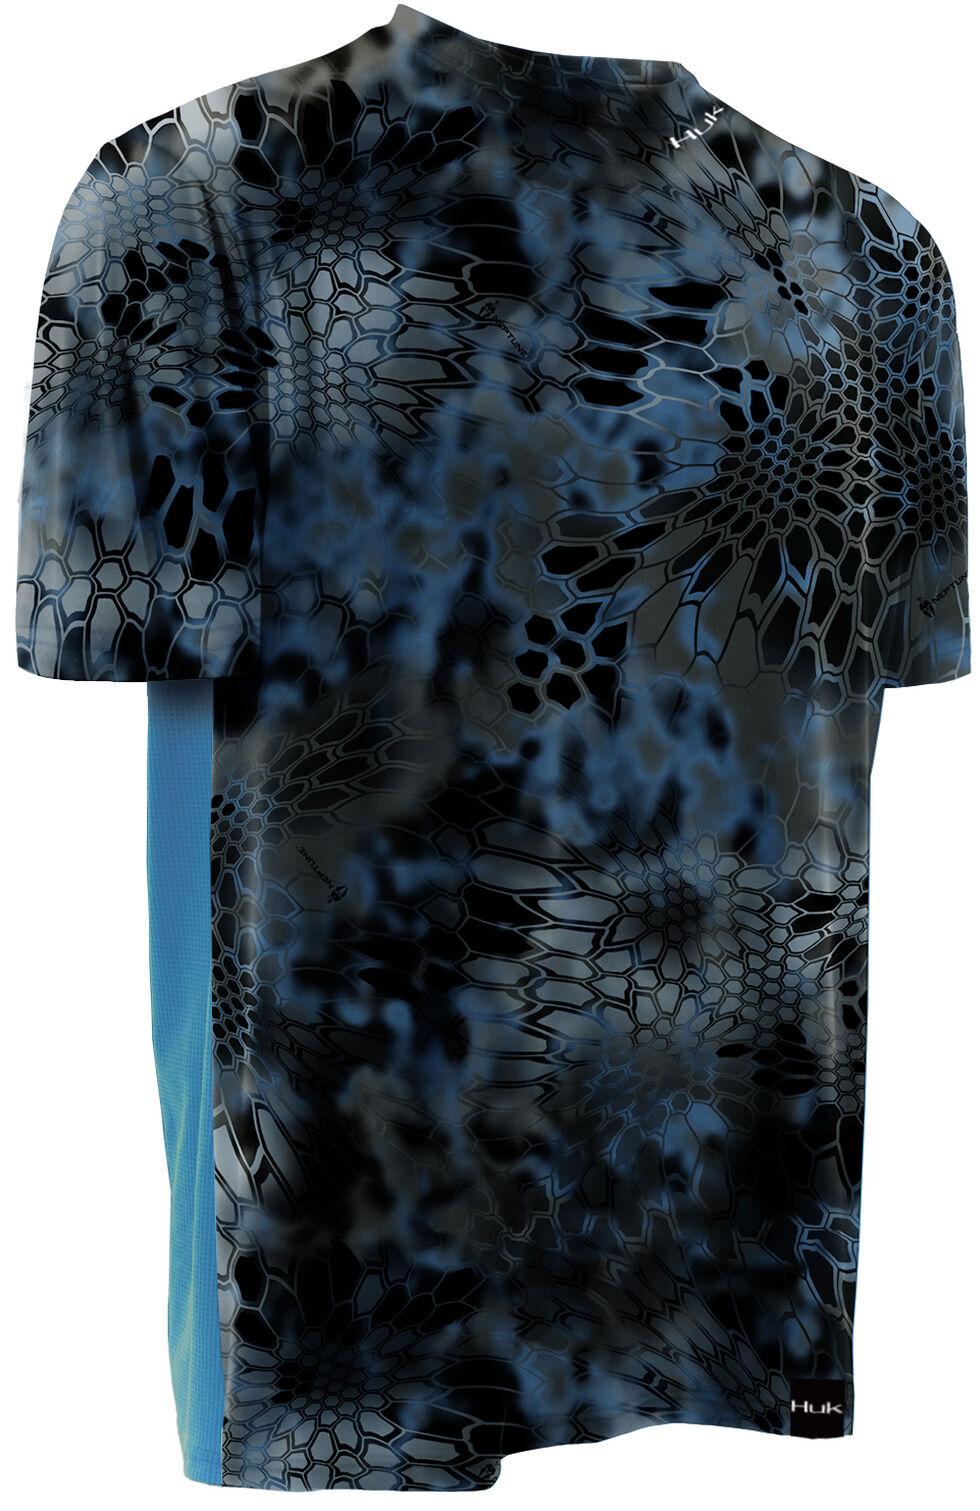 Huk Men's Kryptek LoPro ICON Short Sleeve Top , Charcoal Grey, hi-res